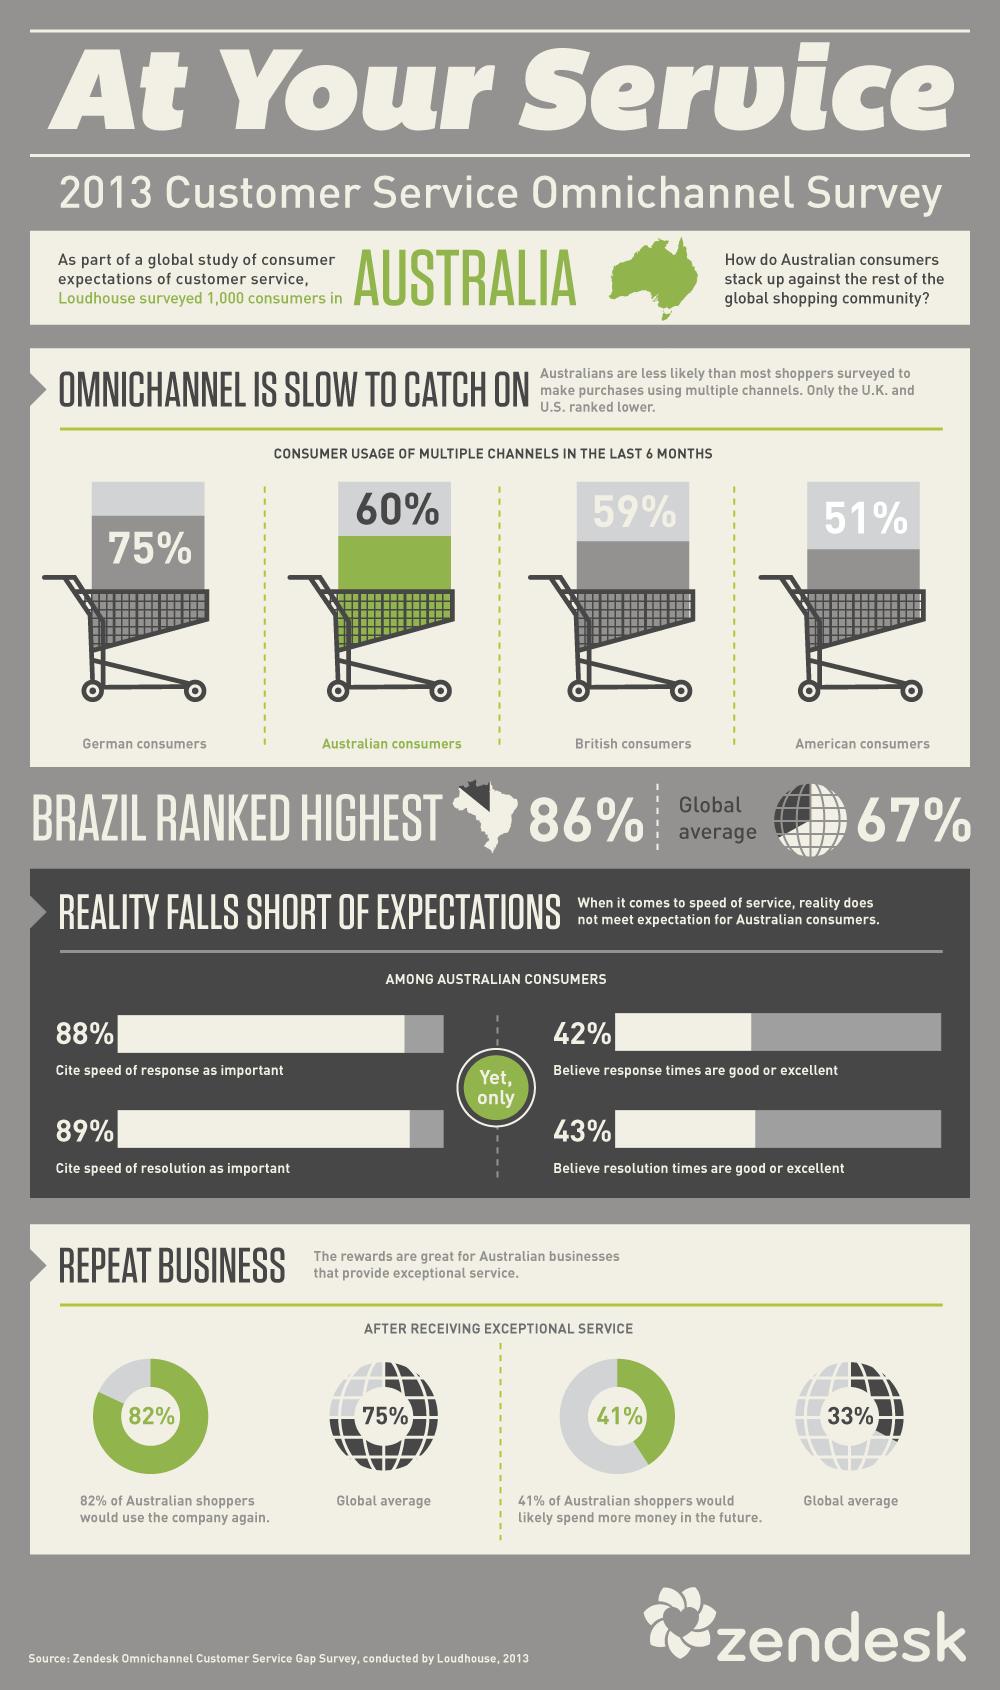 Australia Omnichannel Survey Infographic, Customer